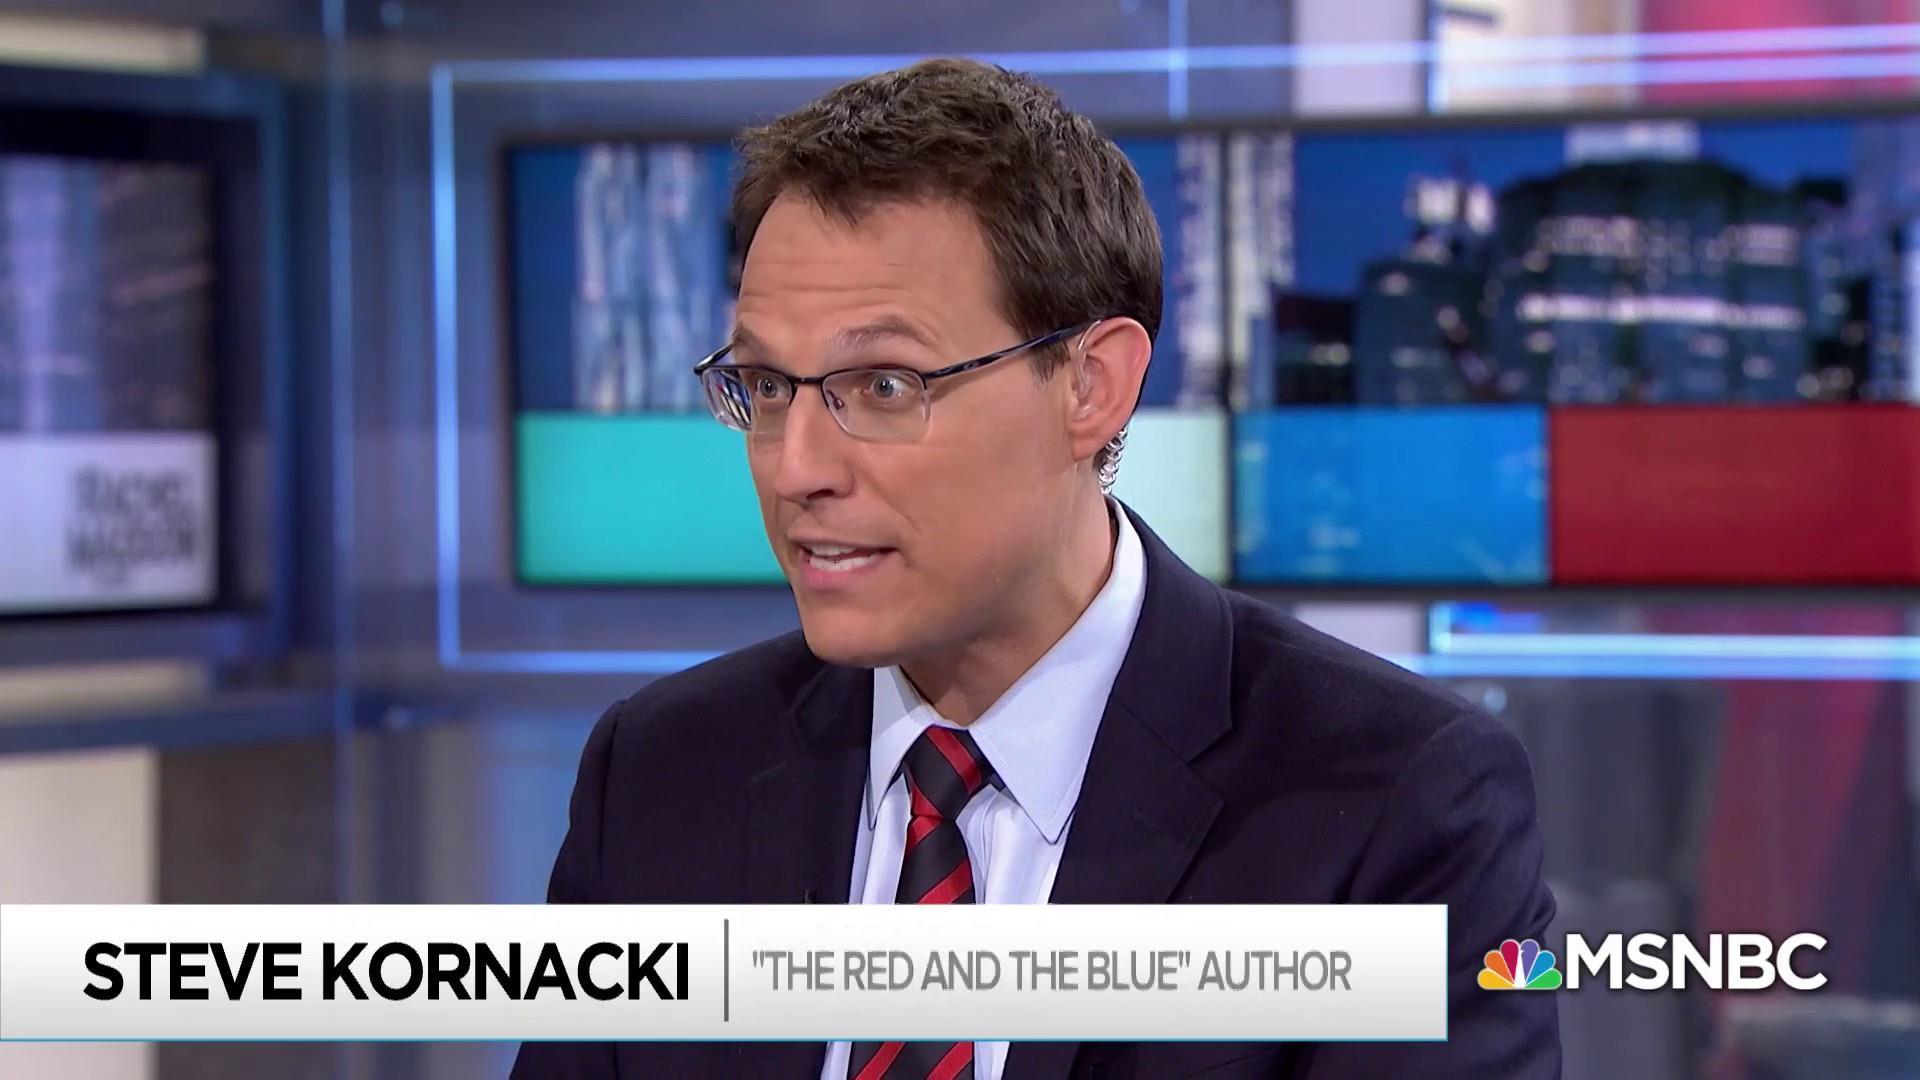 Steve Kornacki on the origins of America's deep political divide